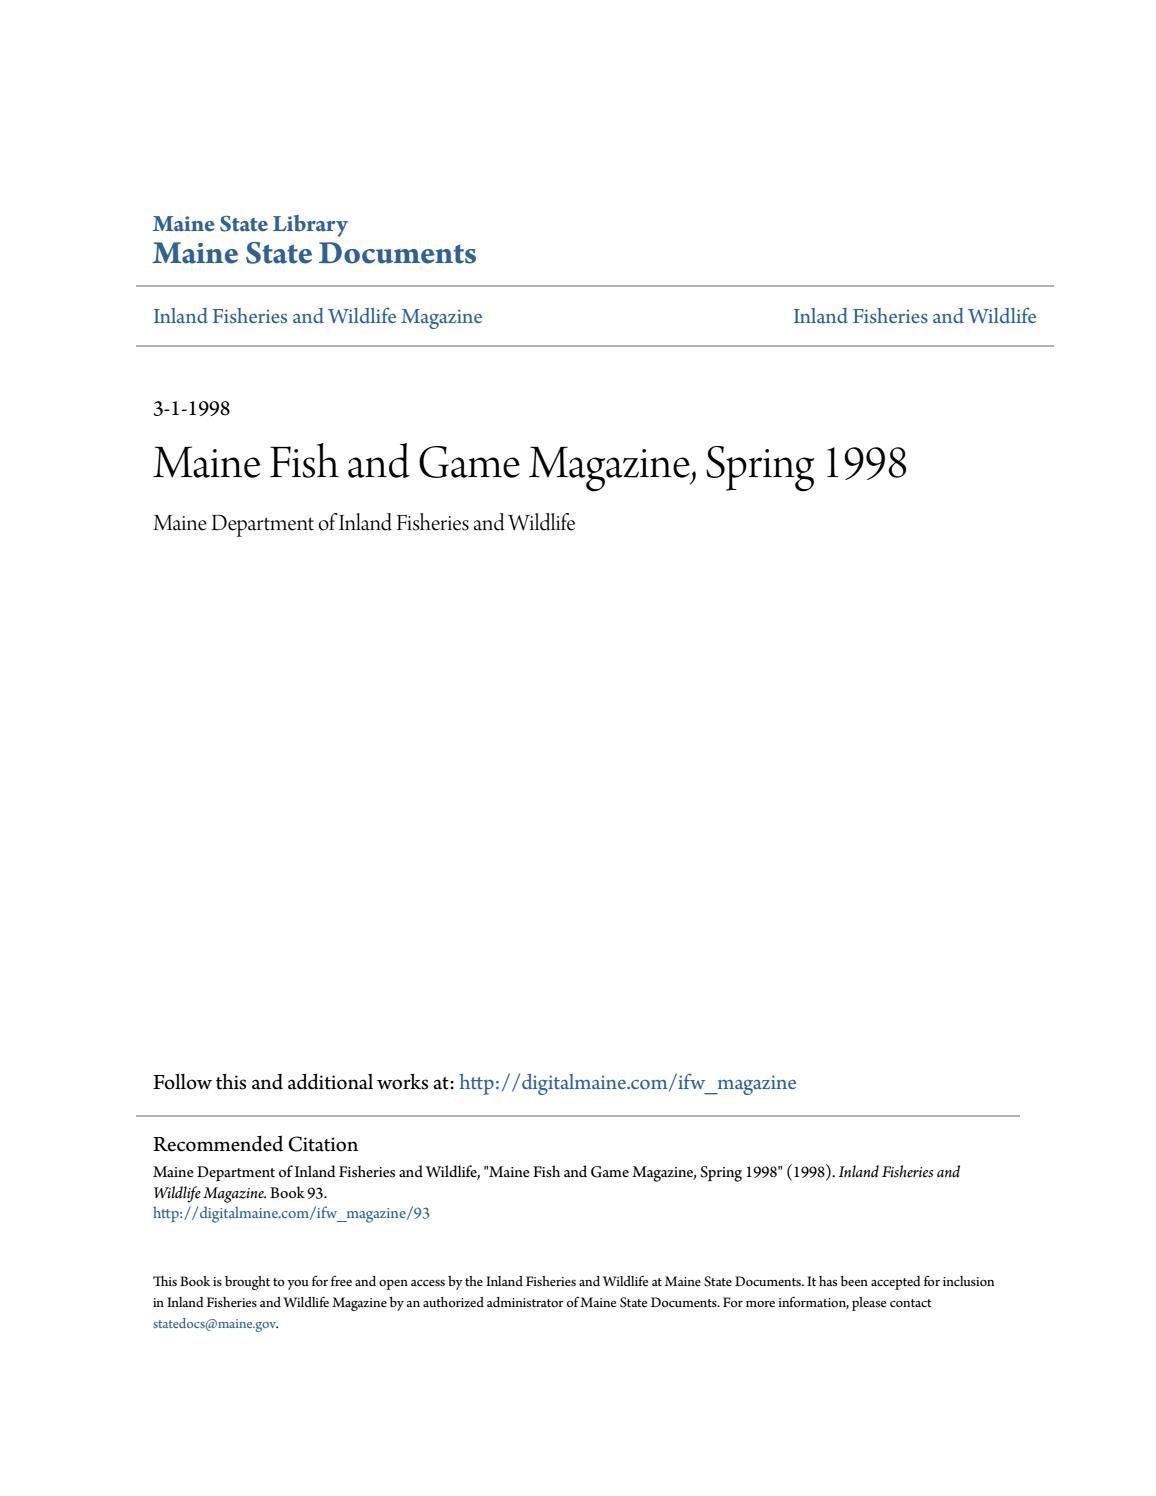 Maine fish and wildlife magazine spring 1998 by maine for Maine state fish